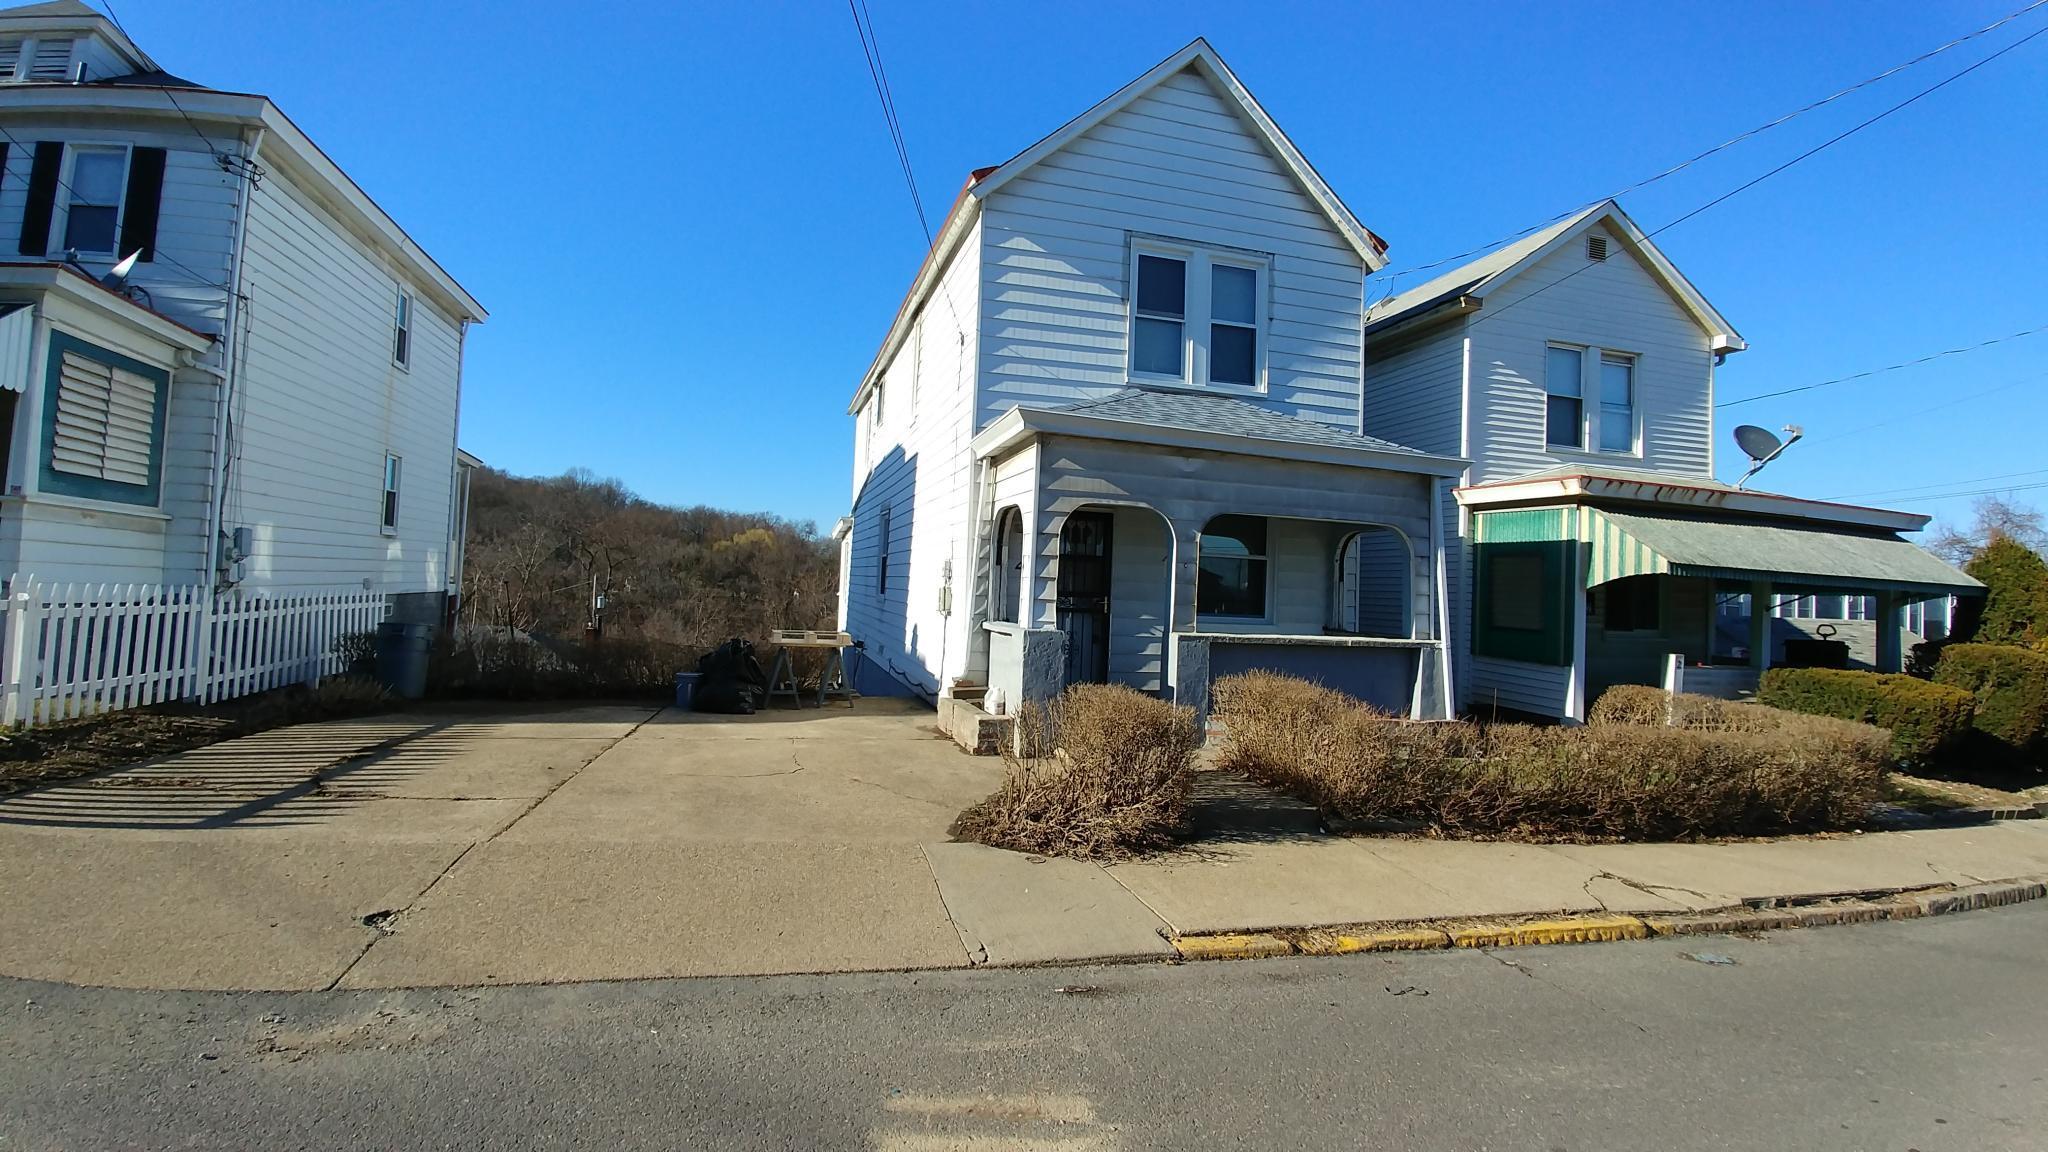 4 Harlem Ave, Mc Kees Rocks, PA 15136 For Rent | Trulia